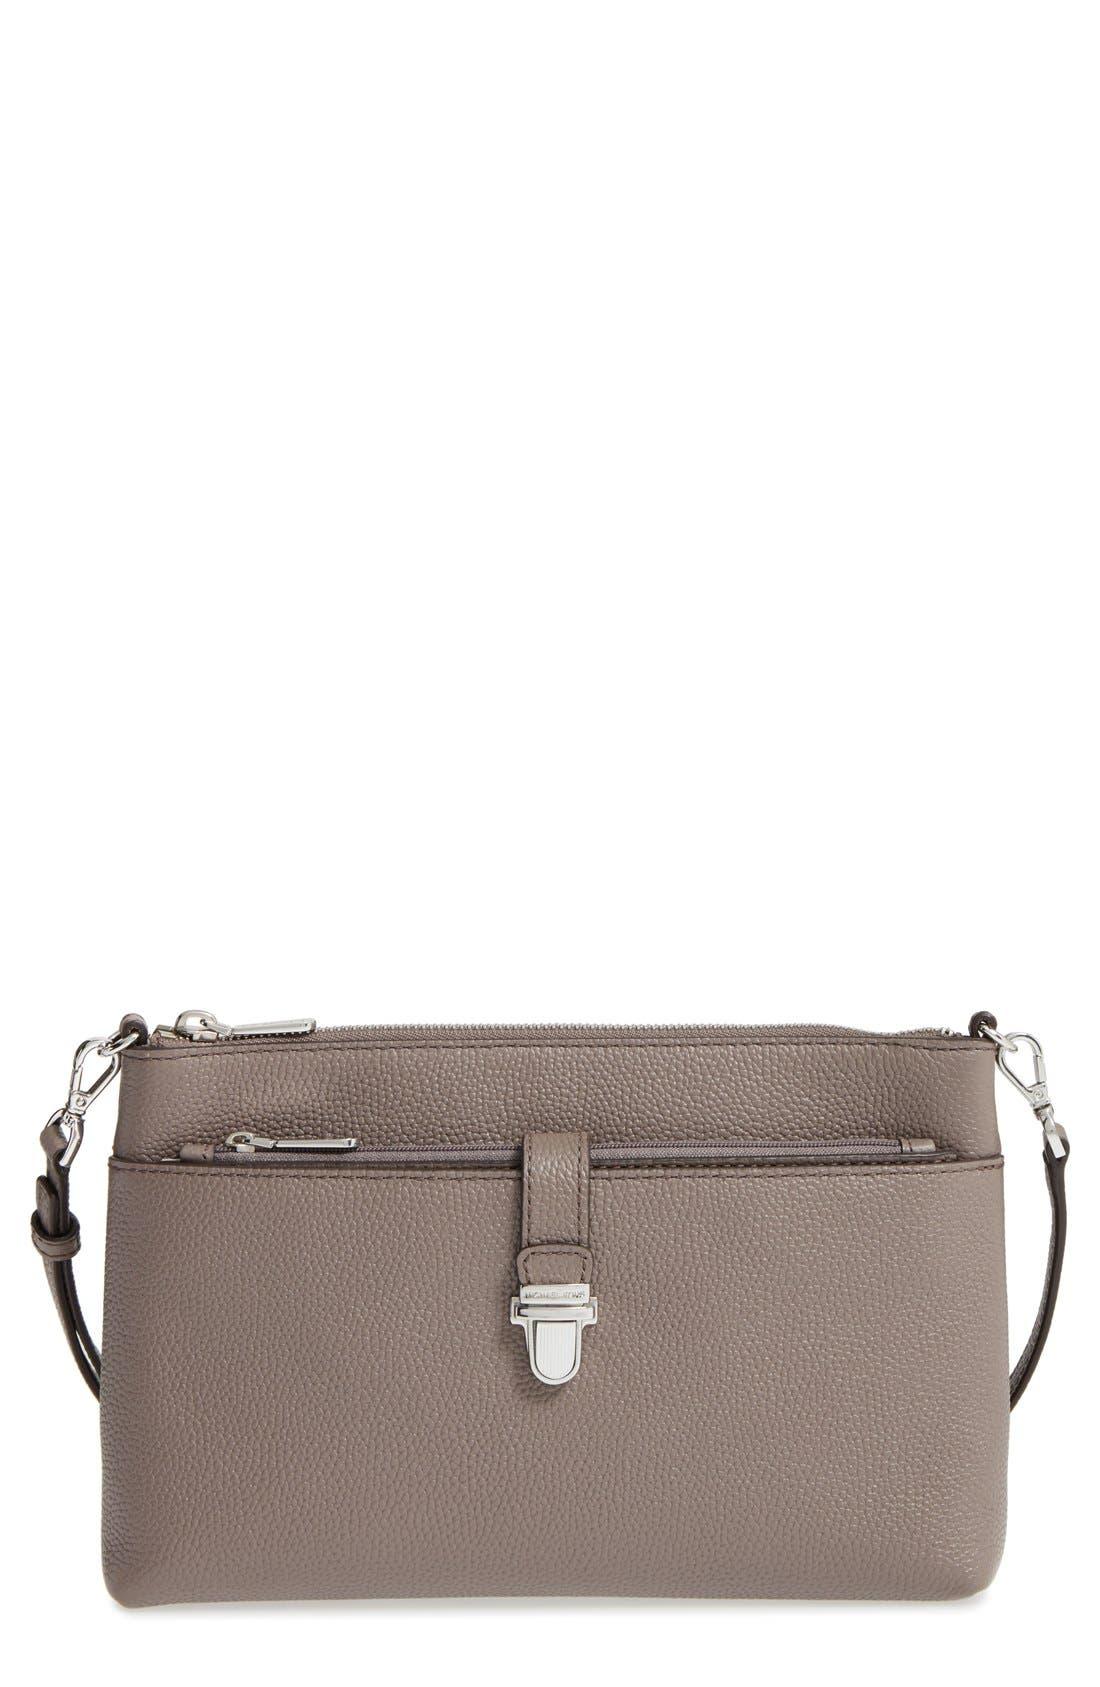 Large Mercer Leather Crossbody Bag,                             Main thumbnail 1, color,                             513